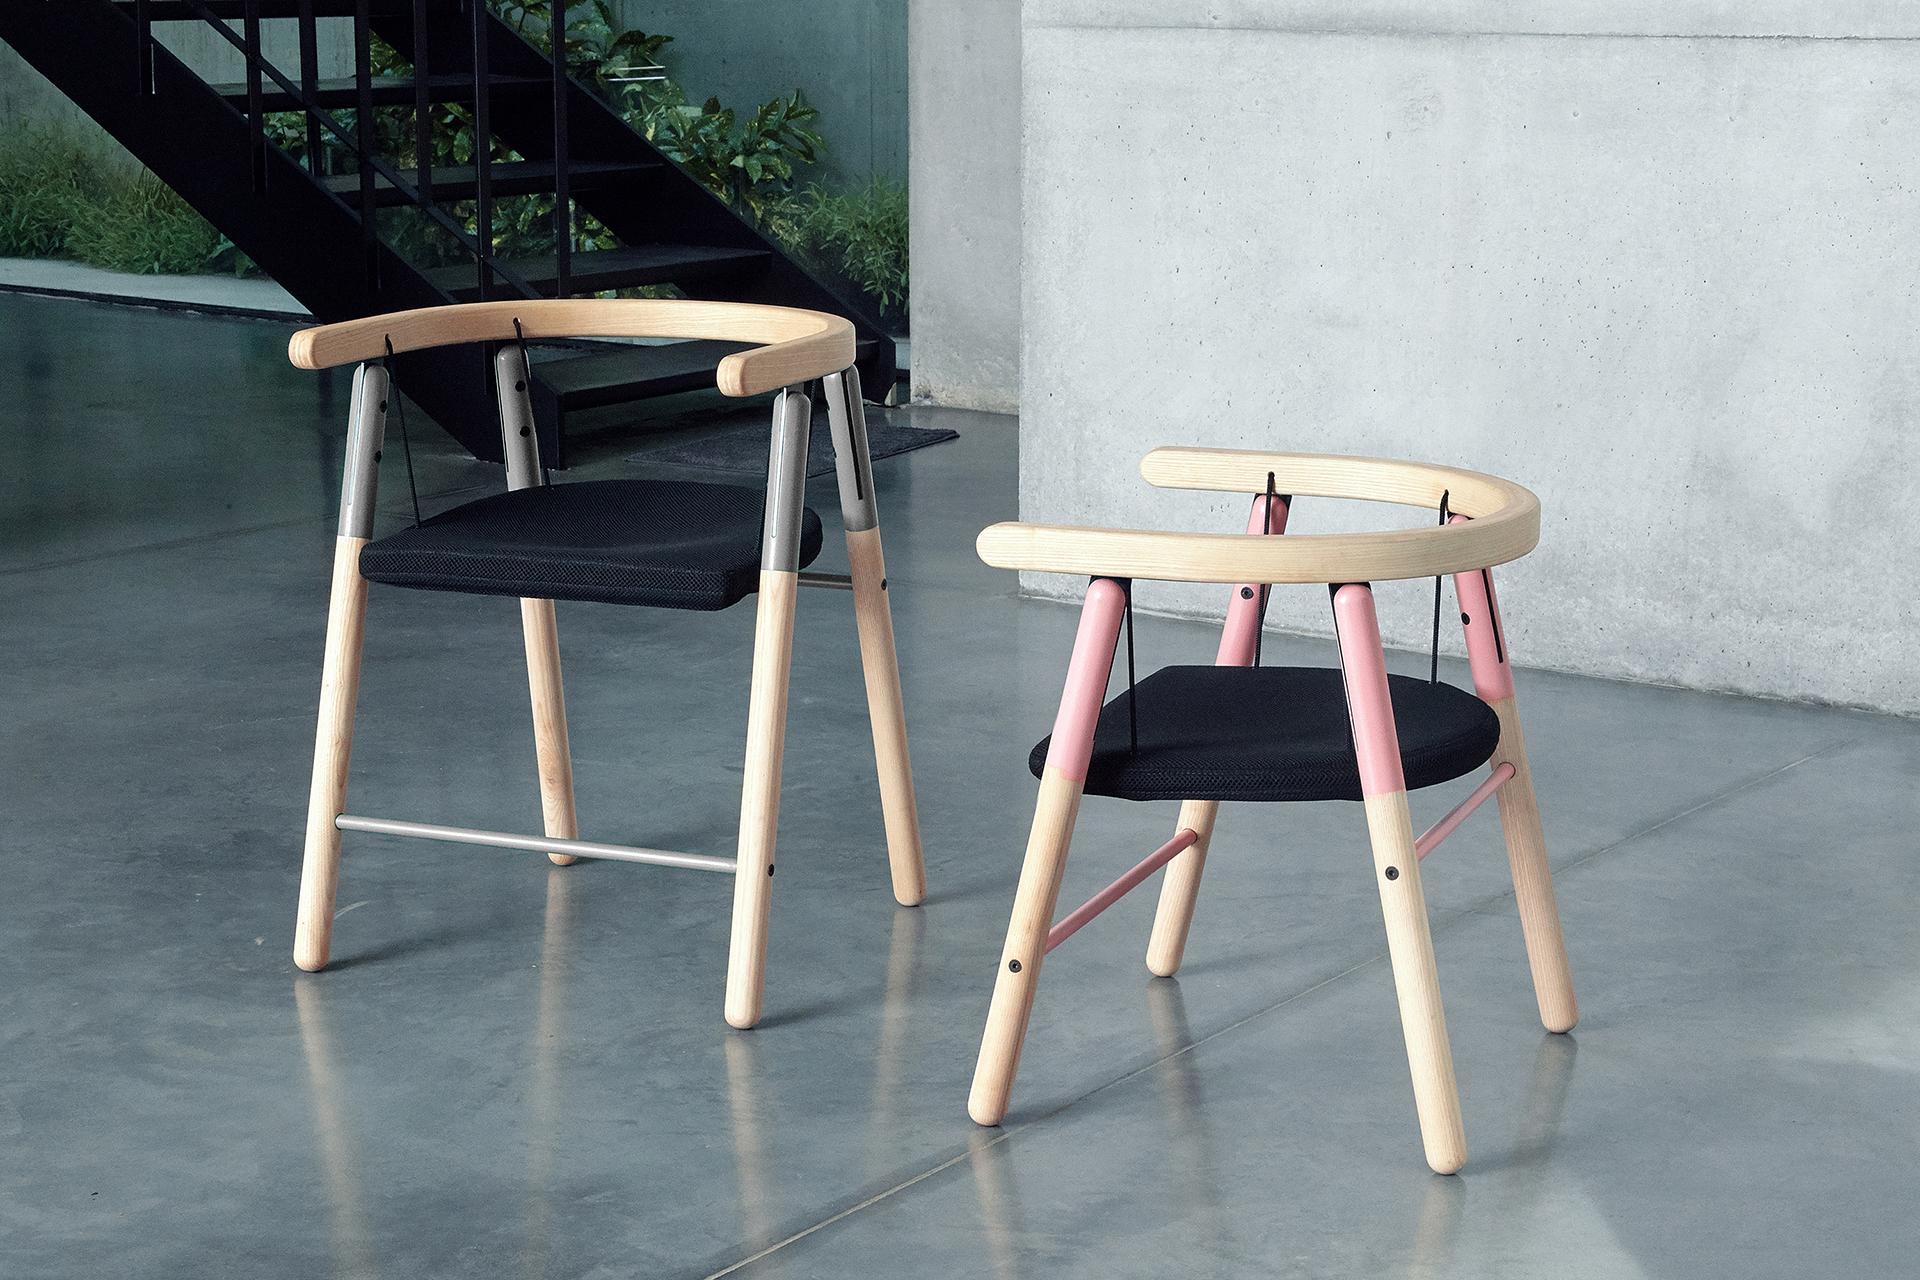 Tink Things sensory furniture 8 (Photo by Misha Obradovic).jpg